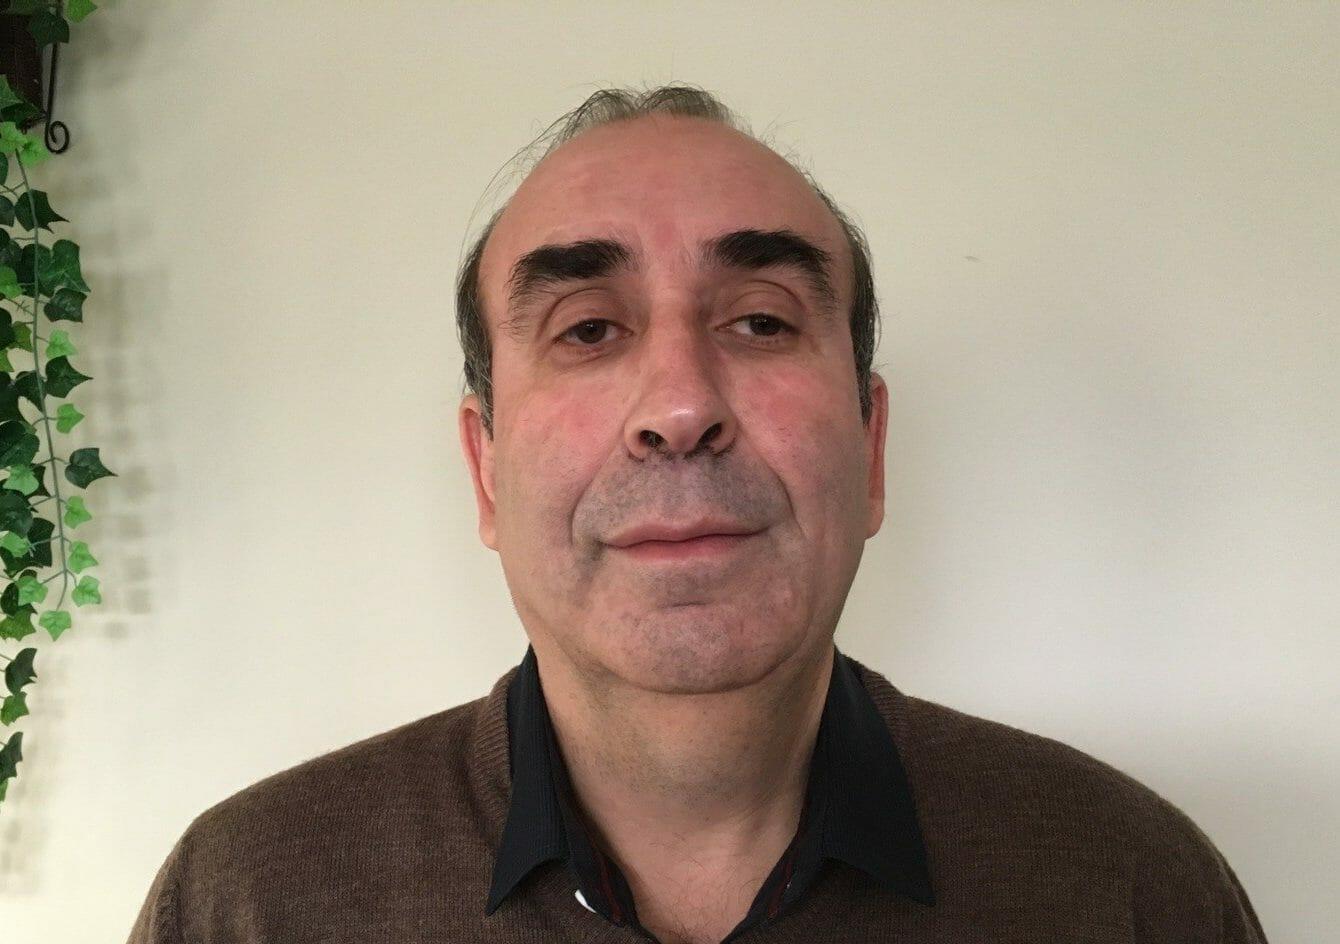 Abdelmadjid Benchamma